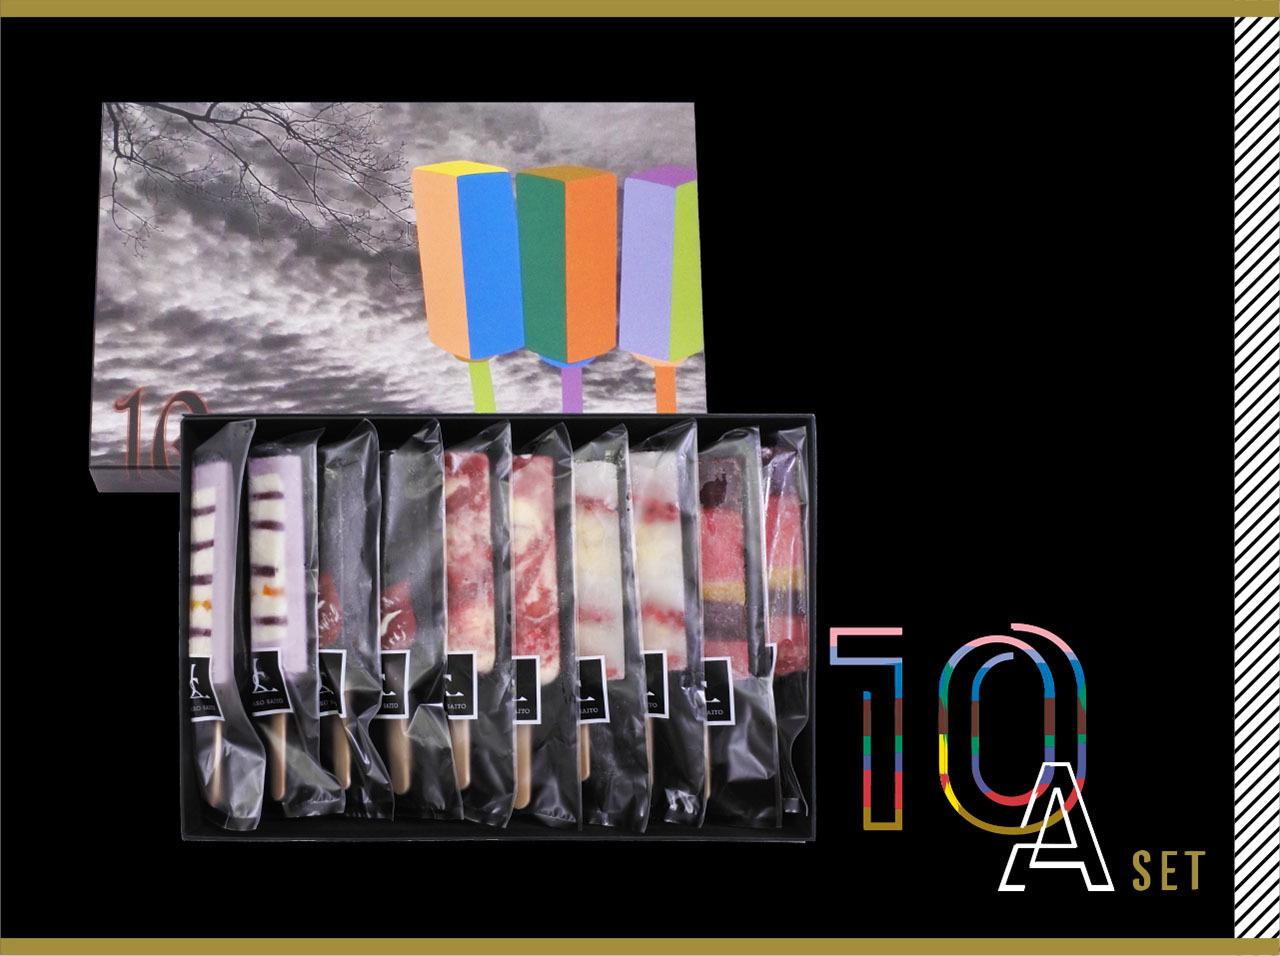 JOTAROアイスバー 5種 10本入Aセット